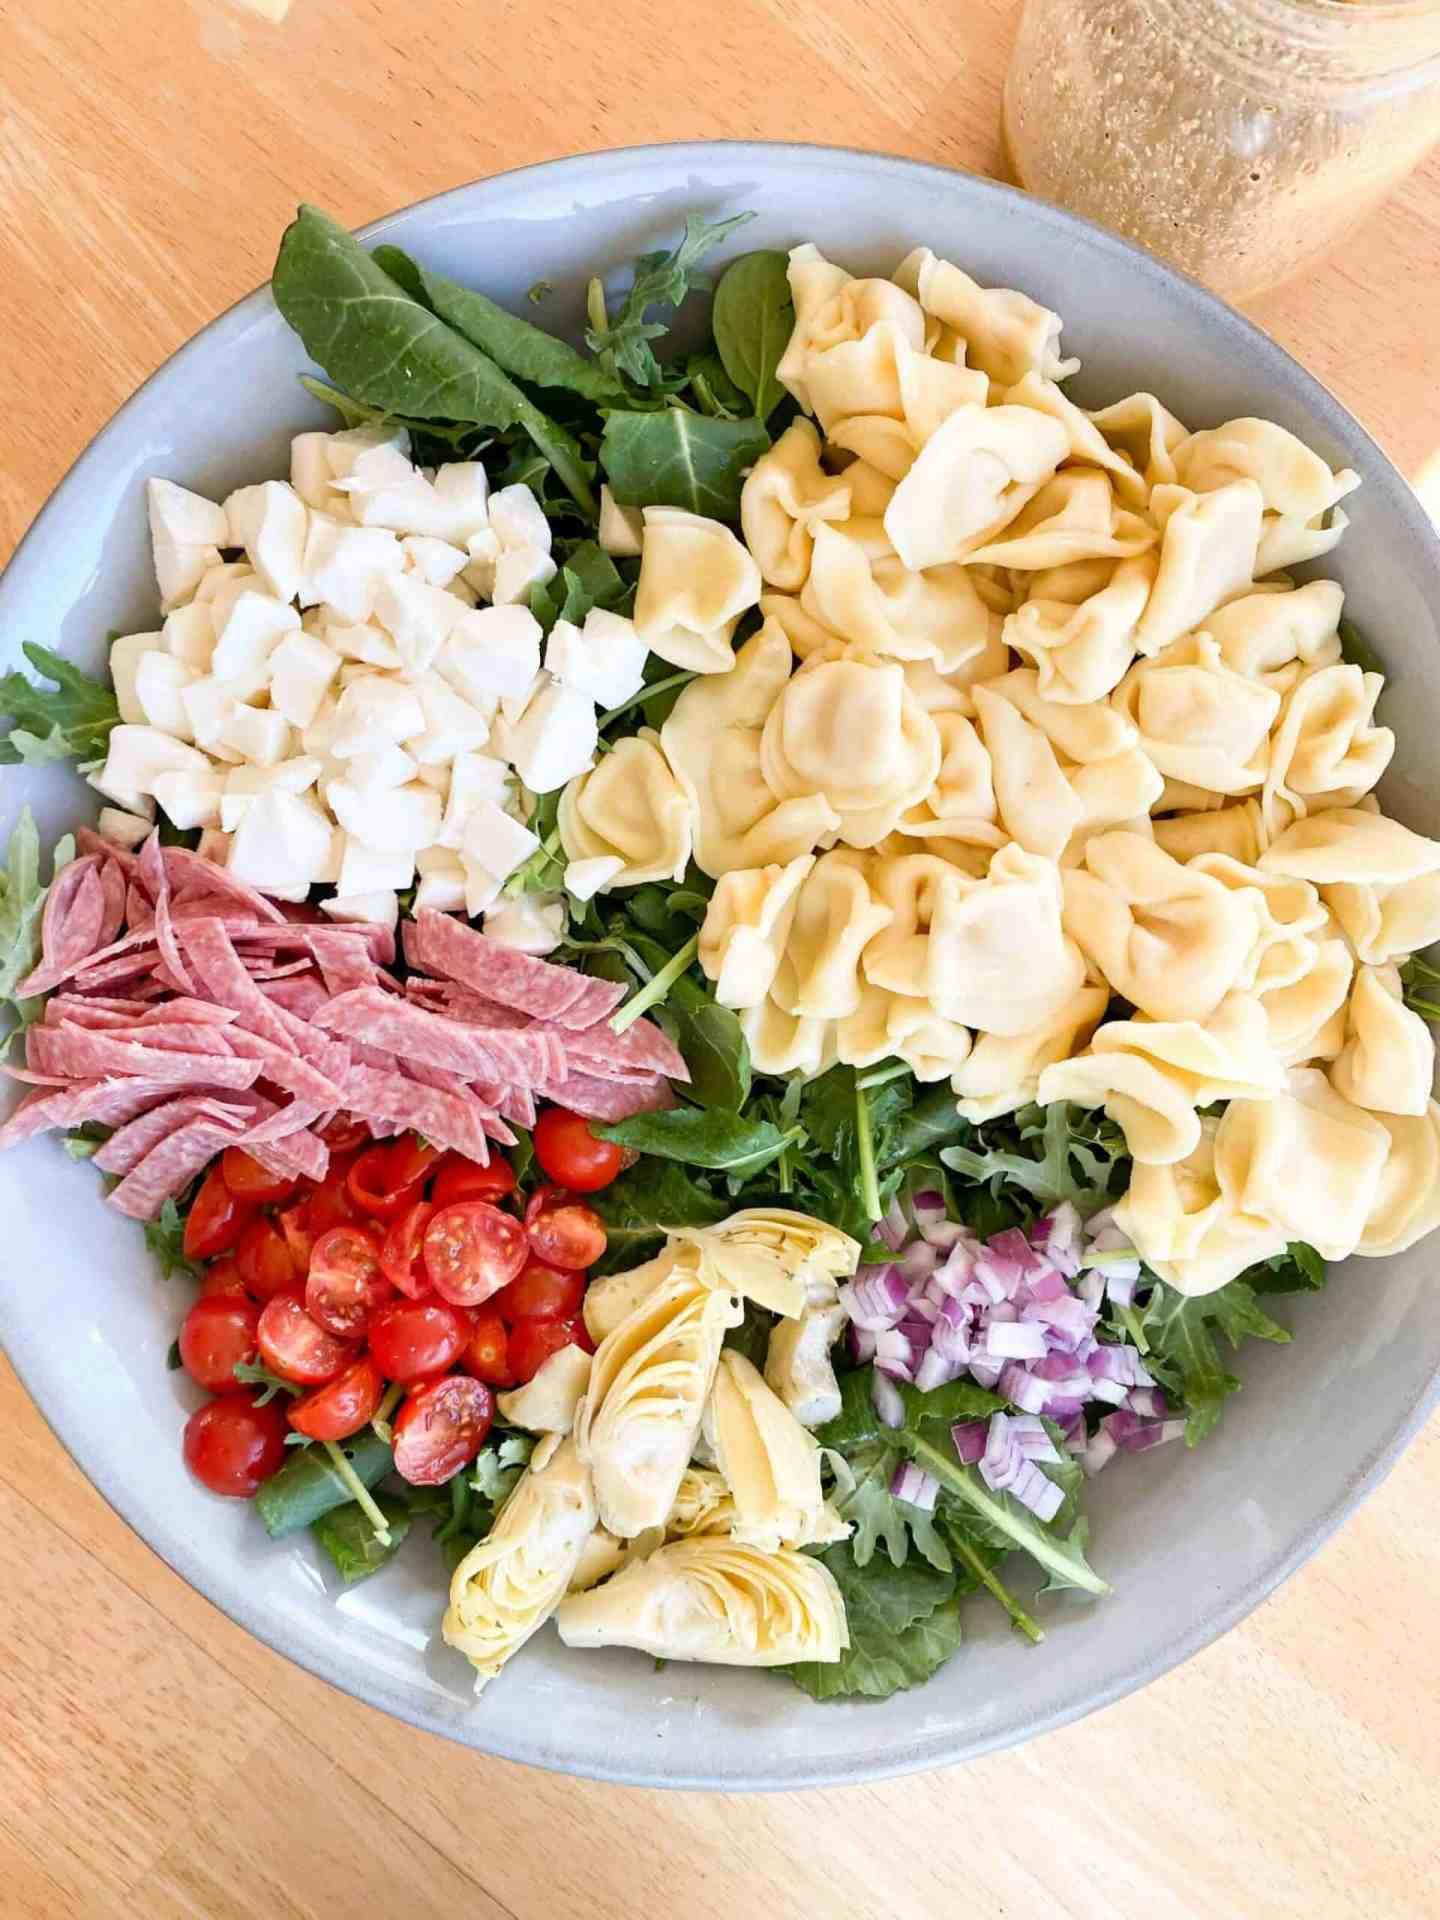 Tortellini-and-Antipasto-Salad-with-Italian-Vinaigrette